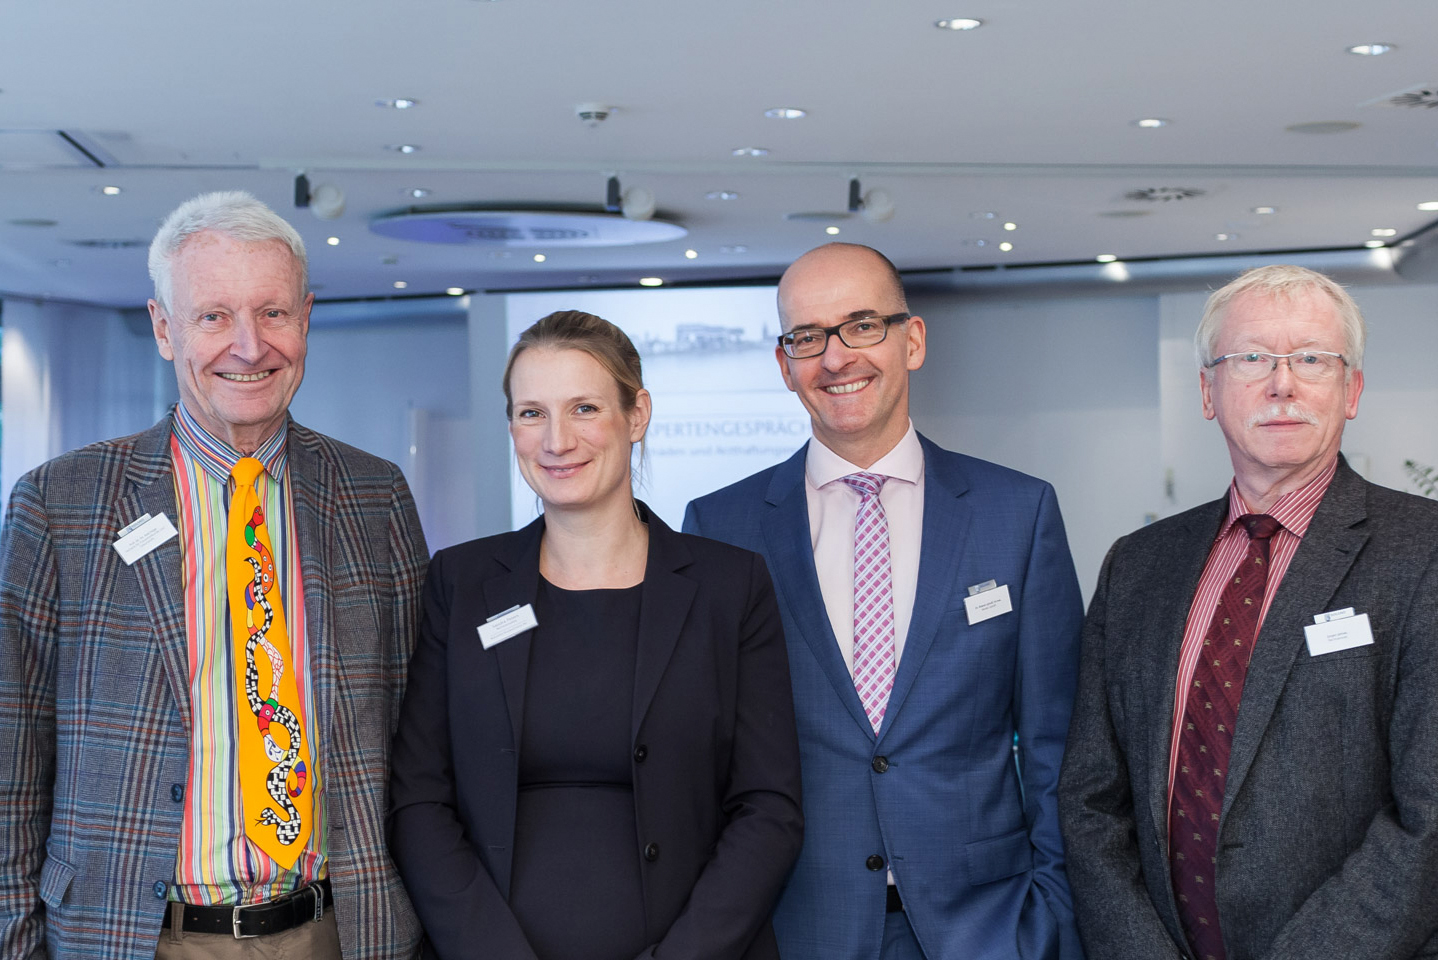 Kölner Expertengespräch Referenten